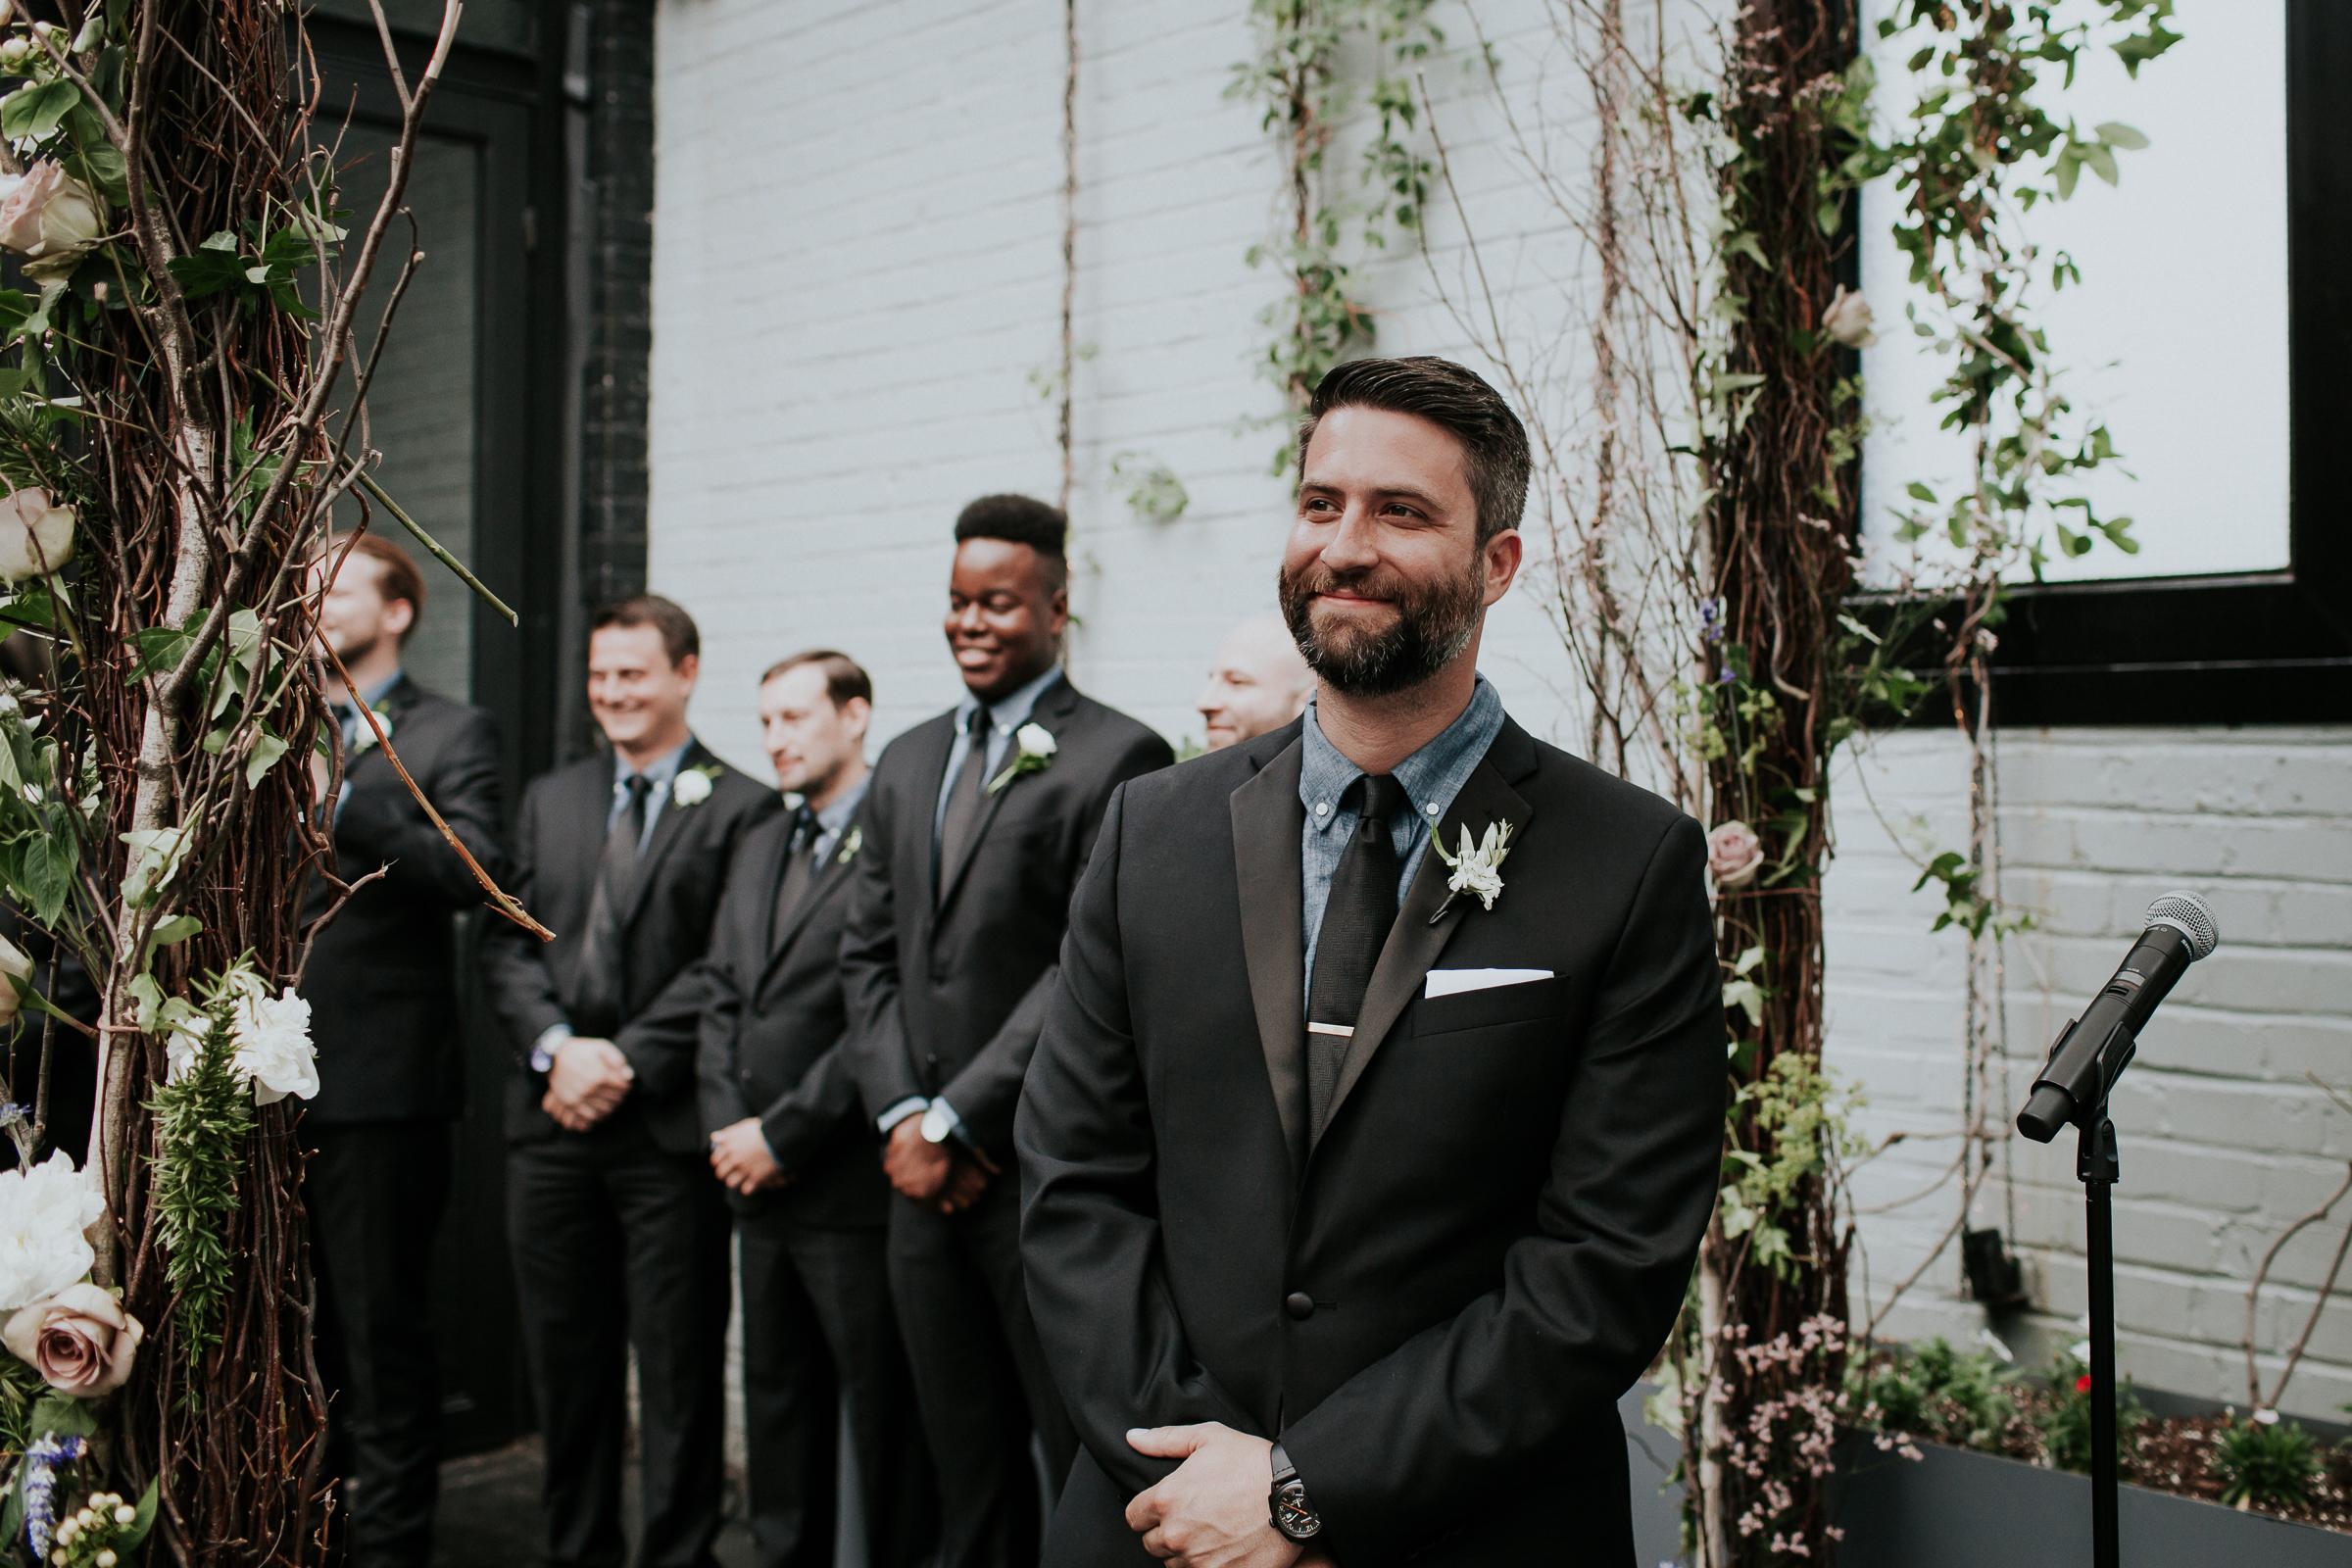 501-Union-Brooklyn-Fine-Art-Documentary-Wedding-Photographer-82.jpg